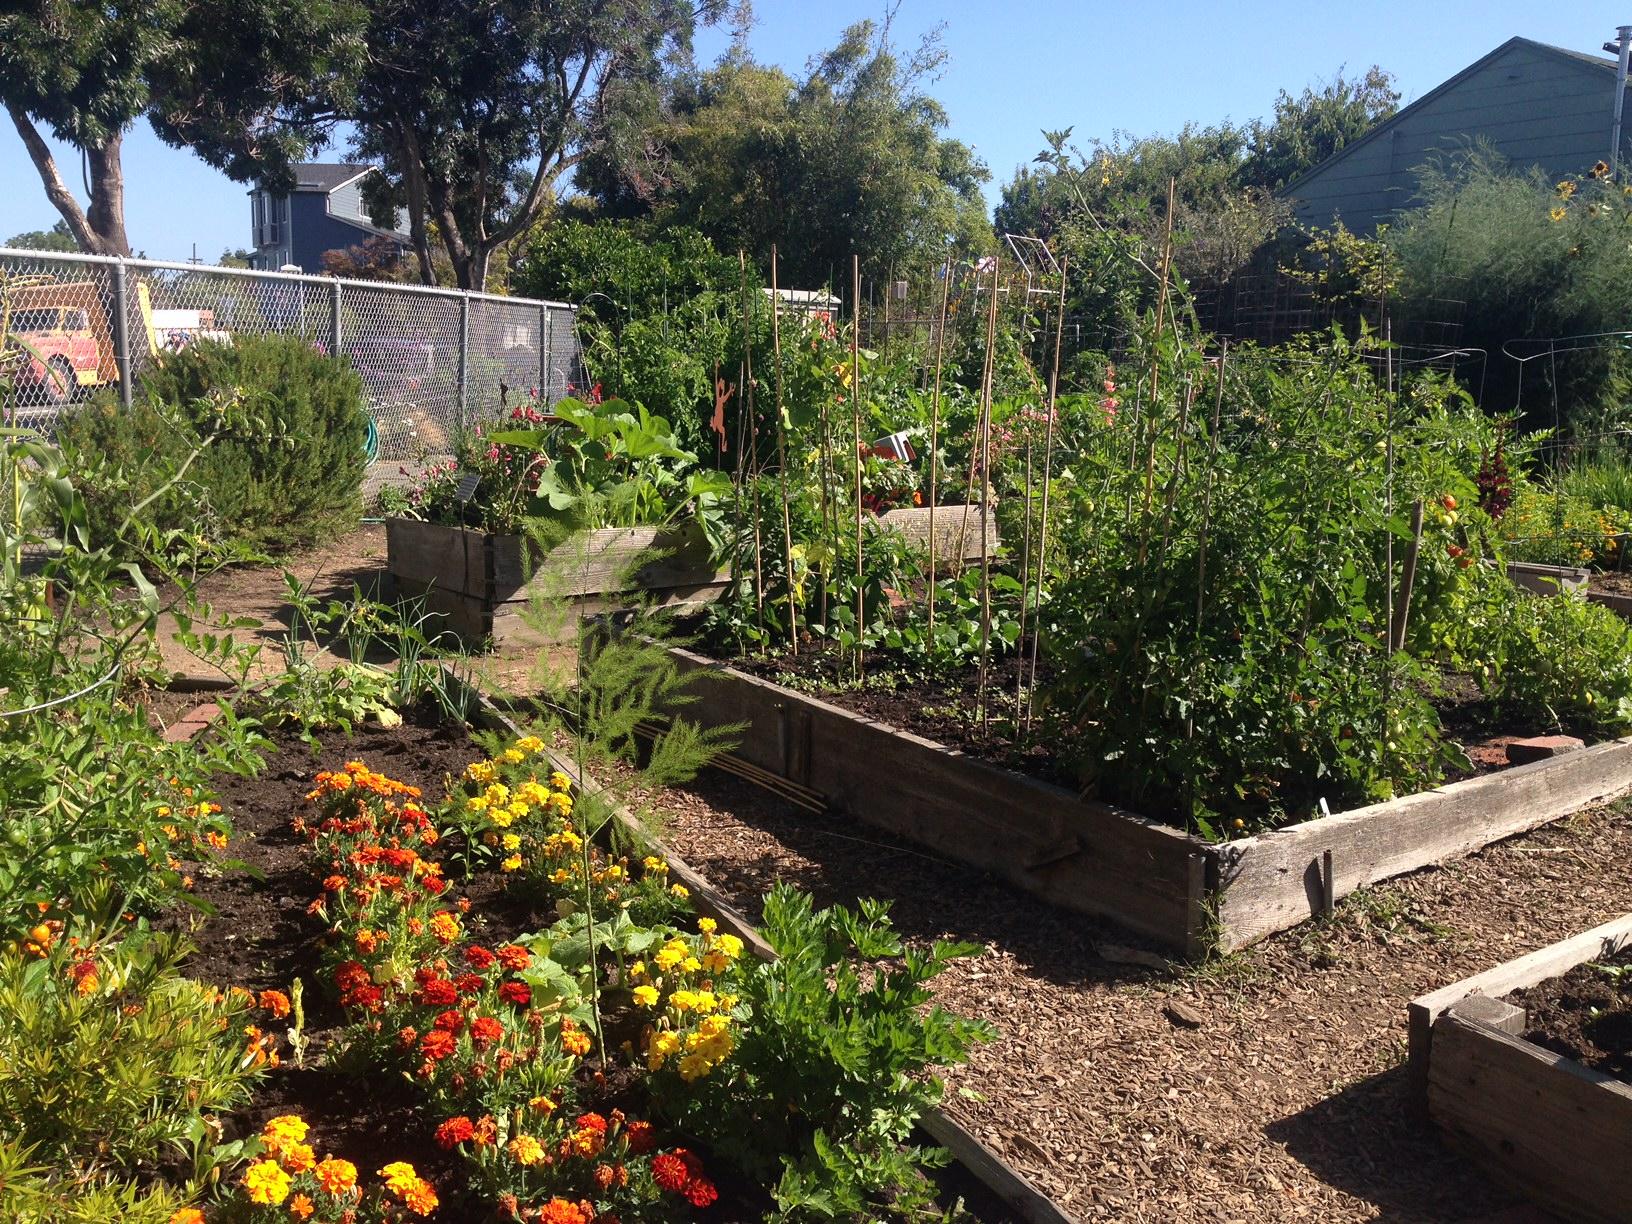 Karl Linn Community Garden is one of dozens of city-subsidized community gardens where residents can grow food.